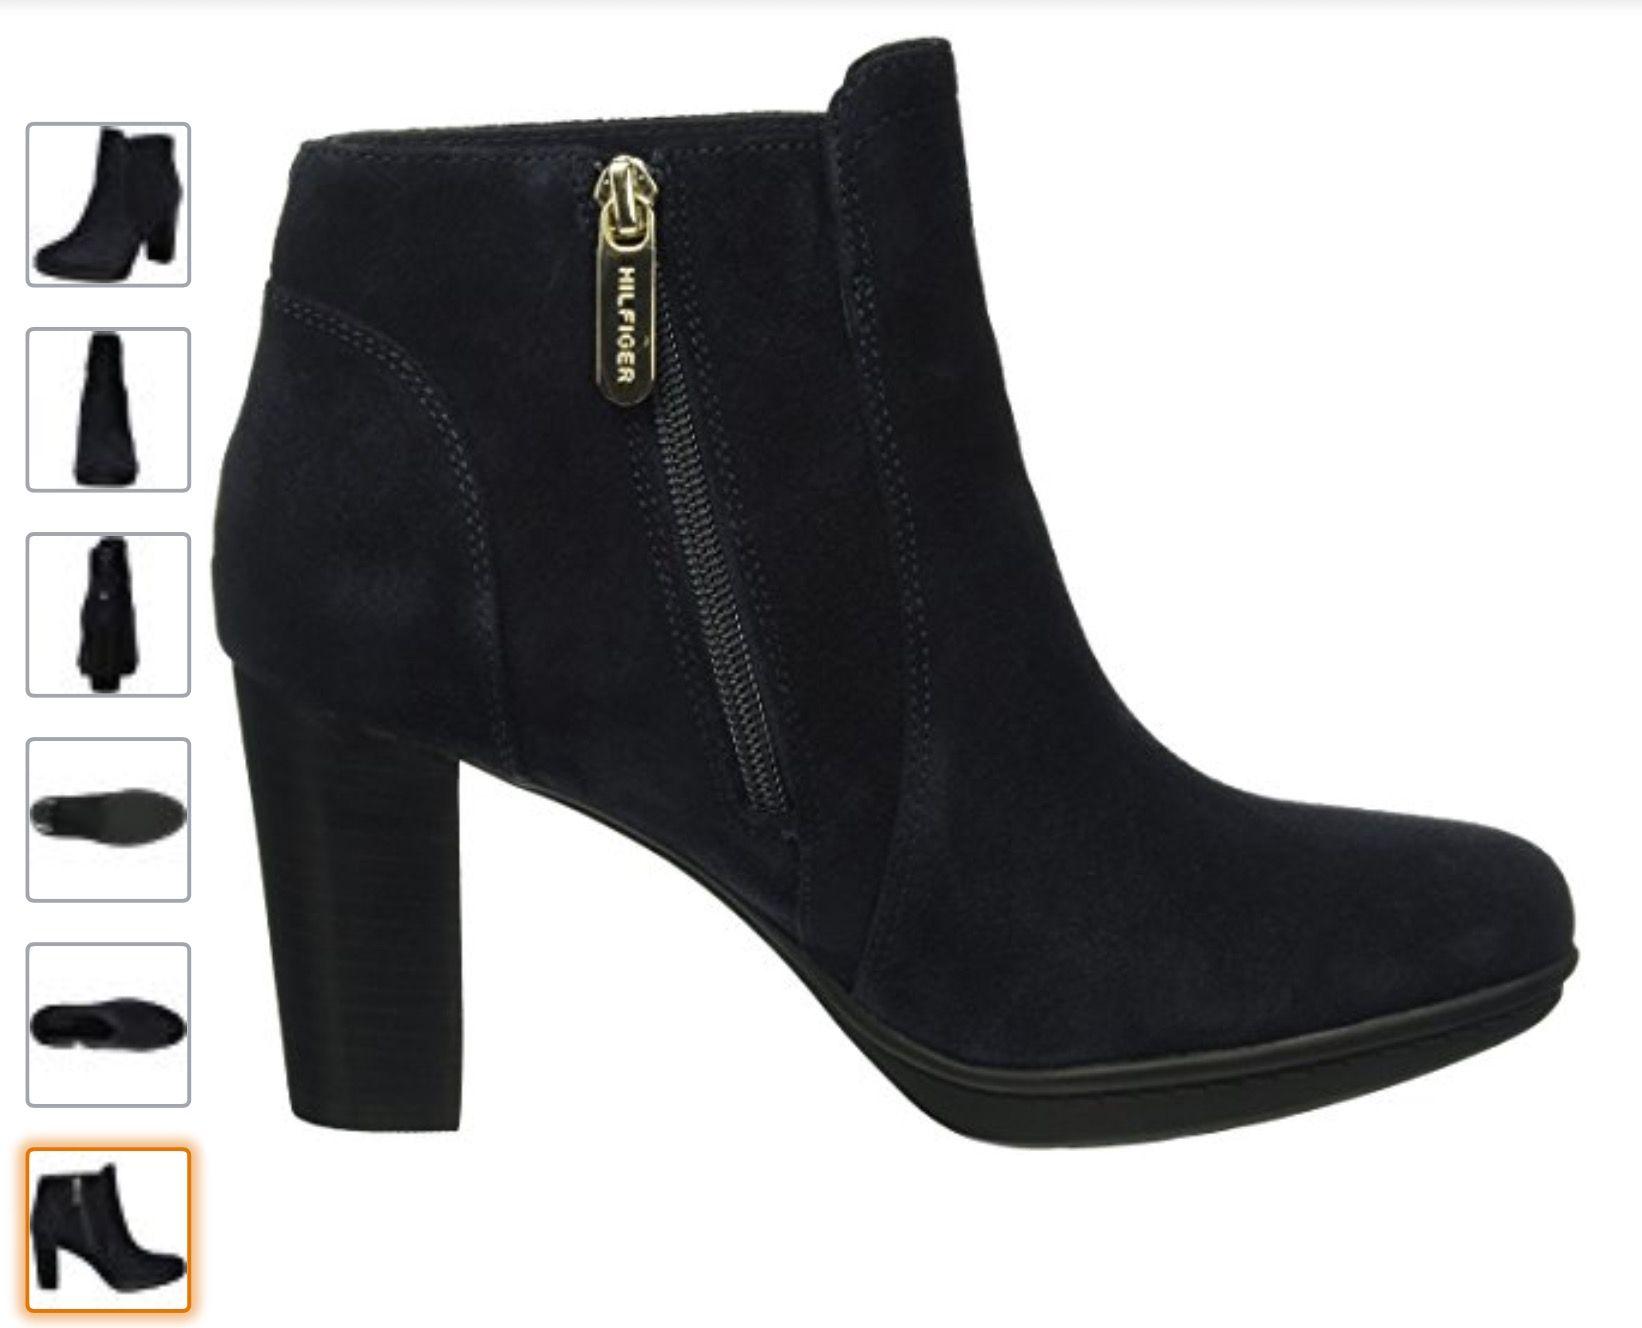 83e7780d77 Tommy Hilfiger Akima blau | Boots und mehr | Boots, Shoes und Tommy ...